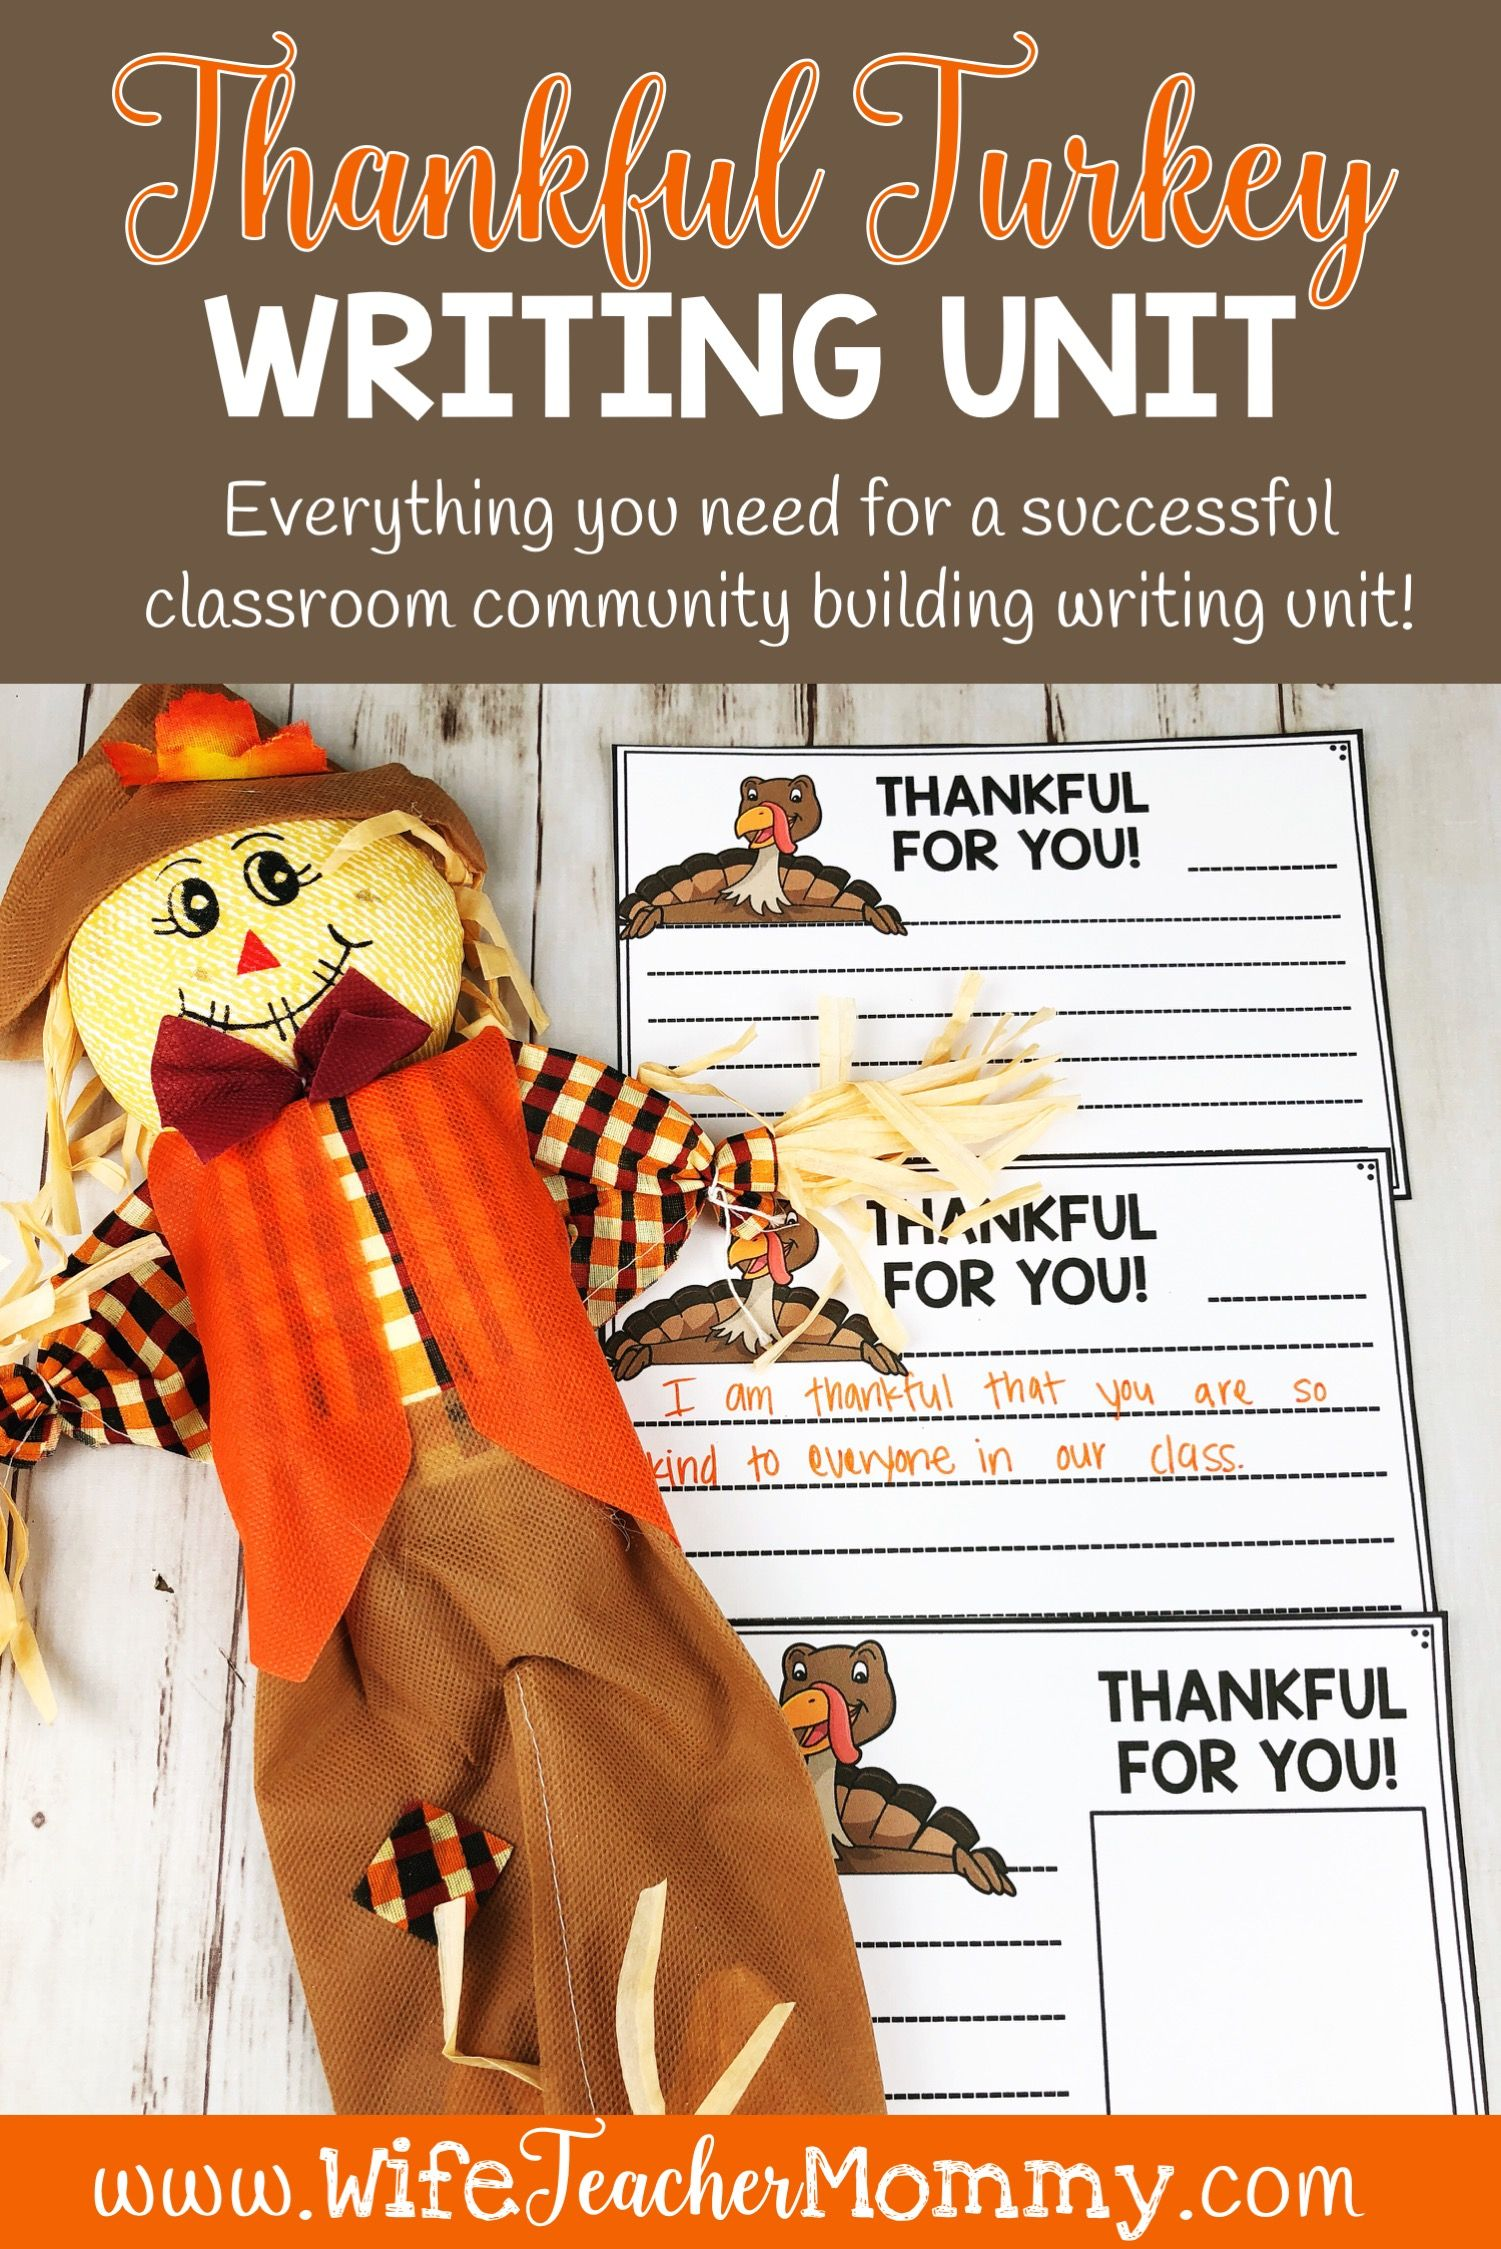 Thanksgiving Thankful Turkeys Writing Unit